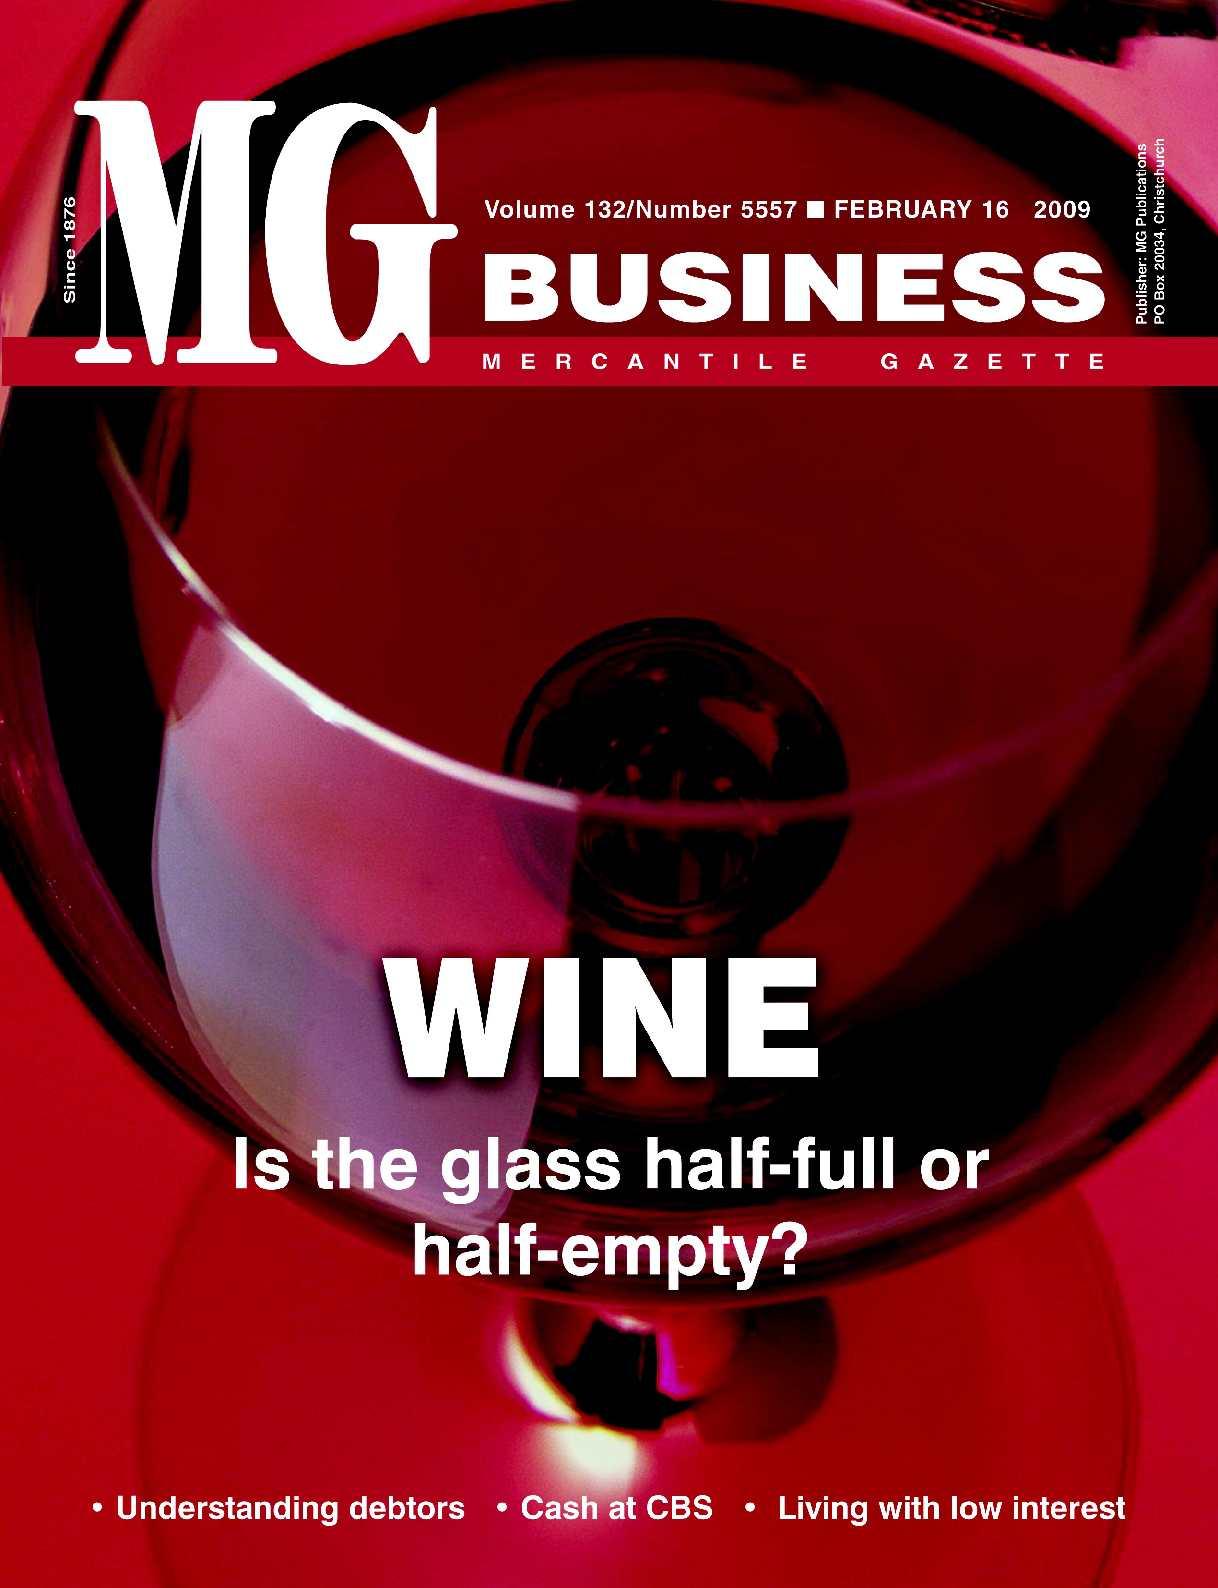 92a65179ff3 Calaméo - MG Business February 16th 2009